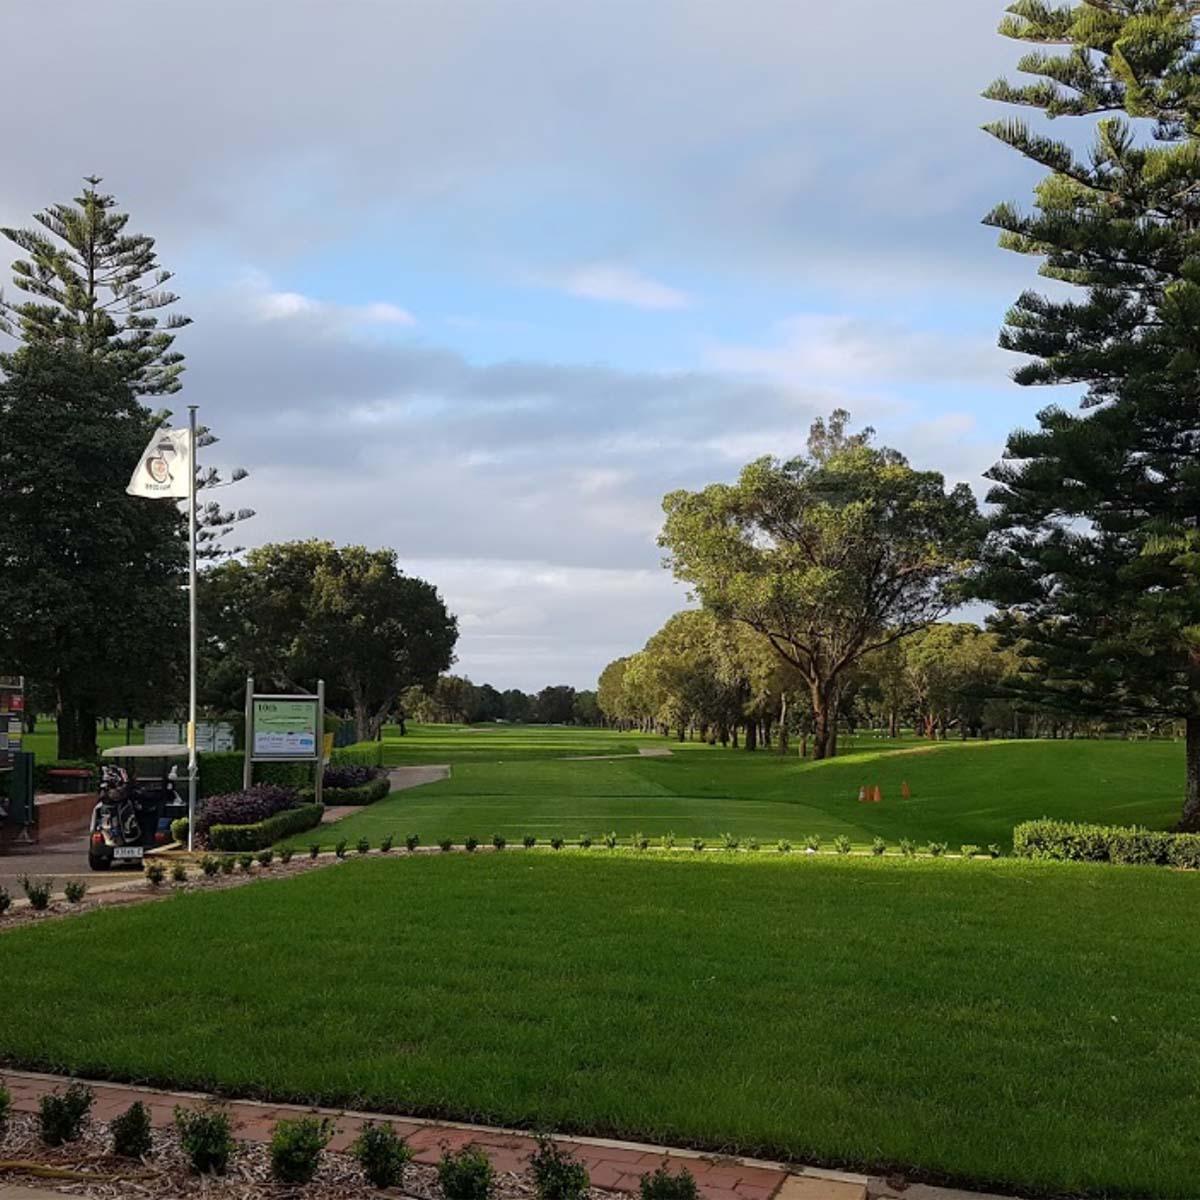 Beverley Park Golf Course